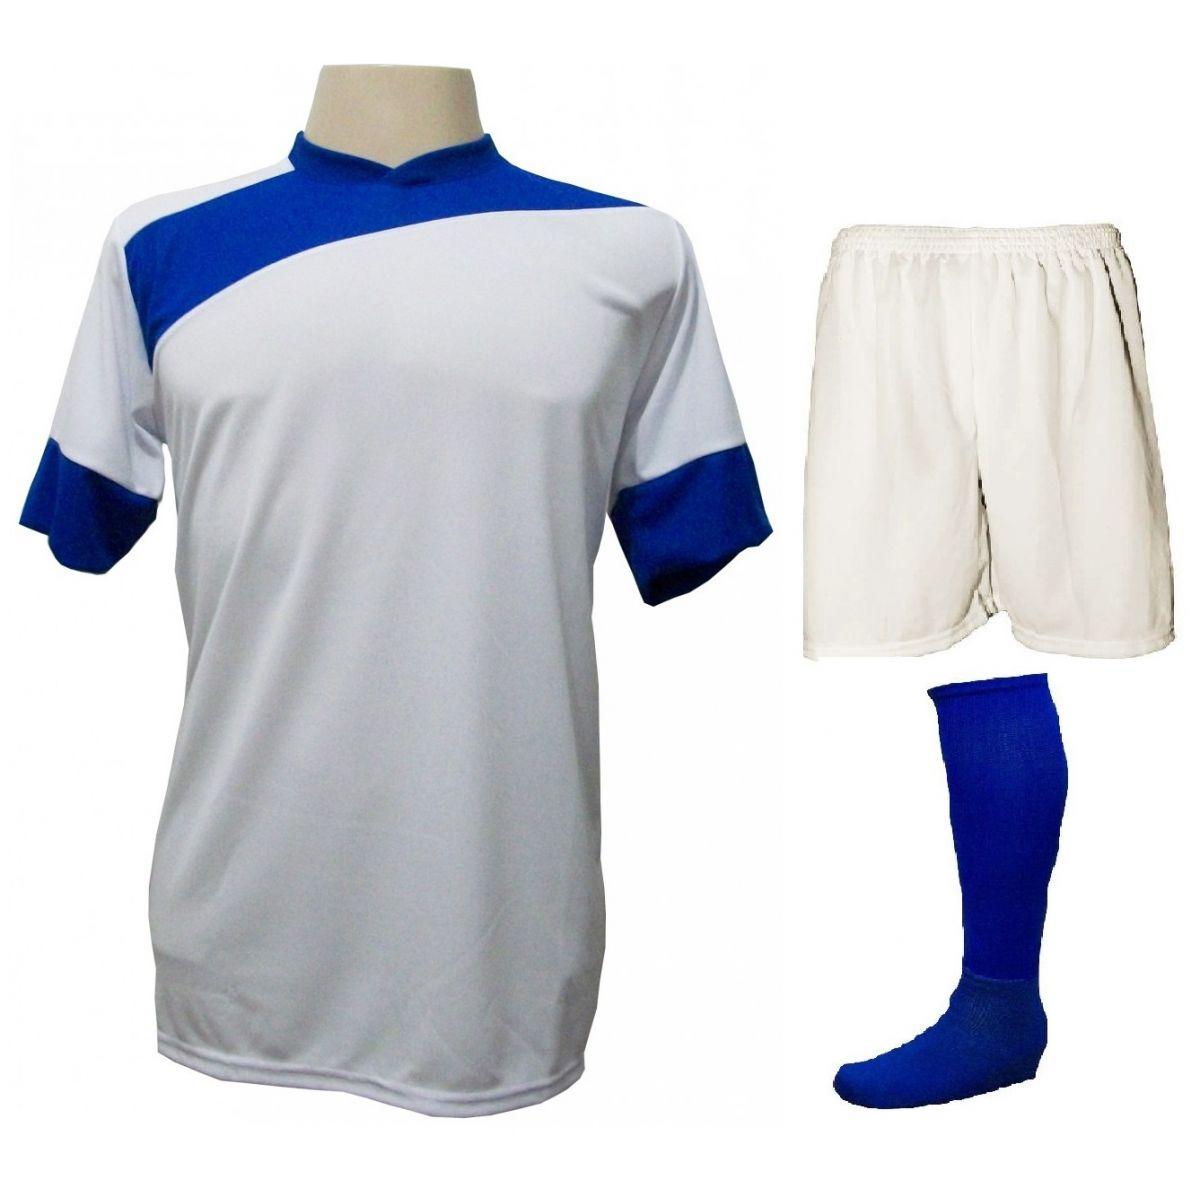 35c00da70693a Uniforme Esportivo Completo modelo Sporting 14+1 (14 camisas Branco Royal +  14 ...